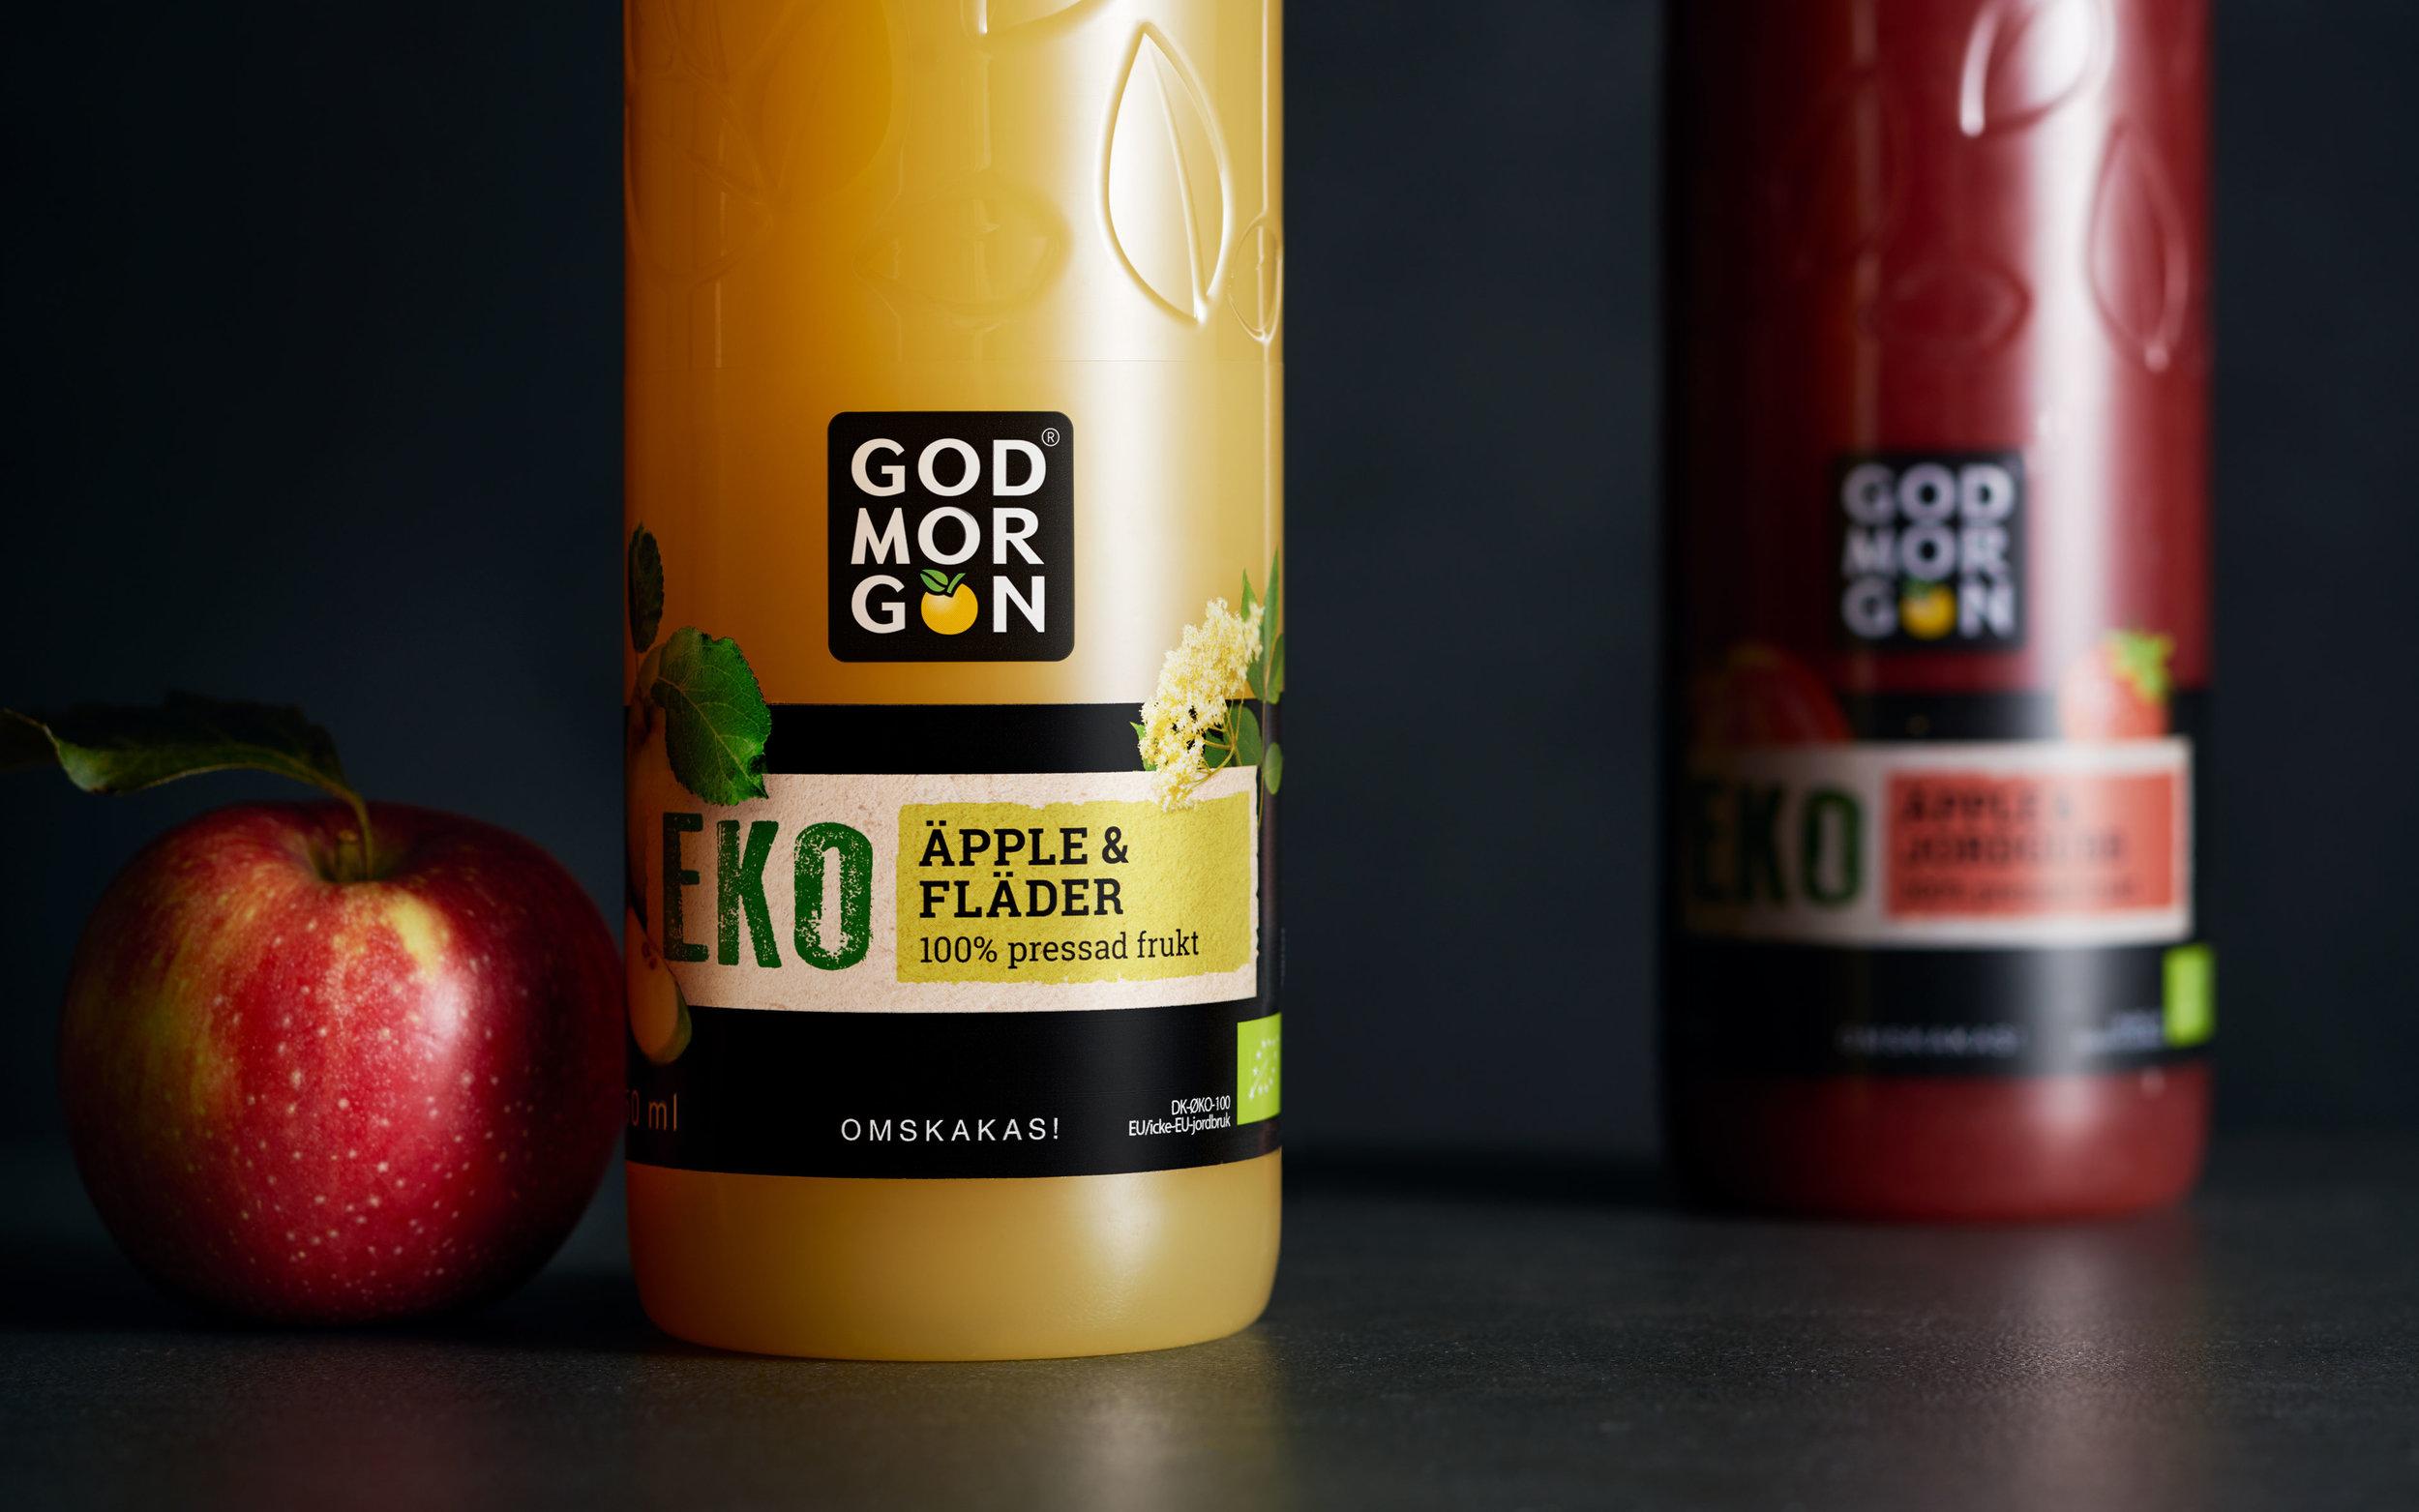 Pond Design - God Morgon EKO Juice2.jpg